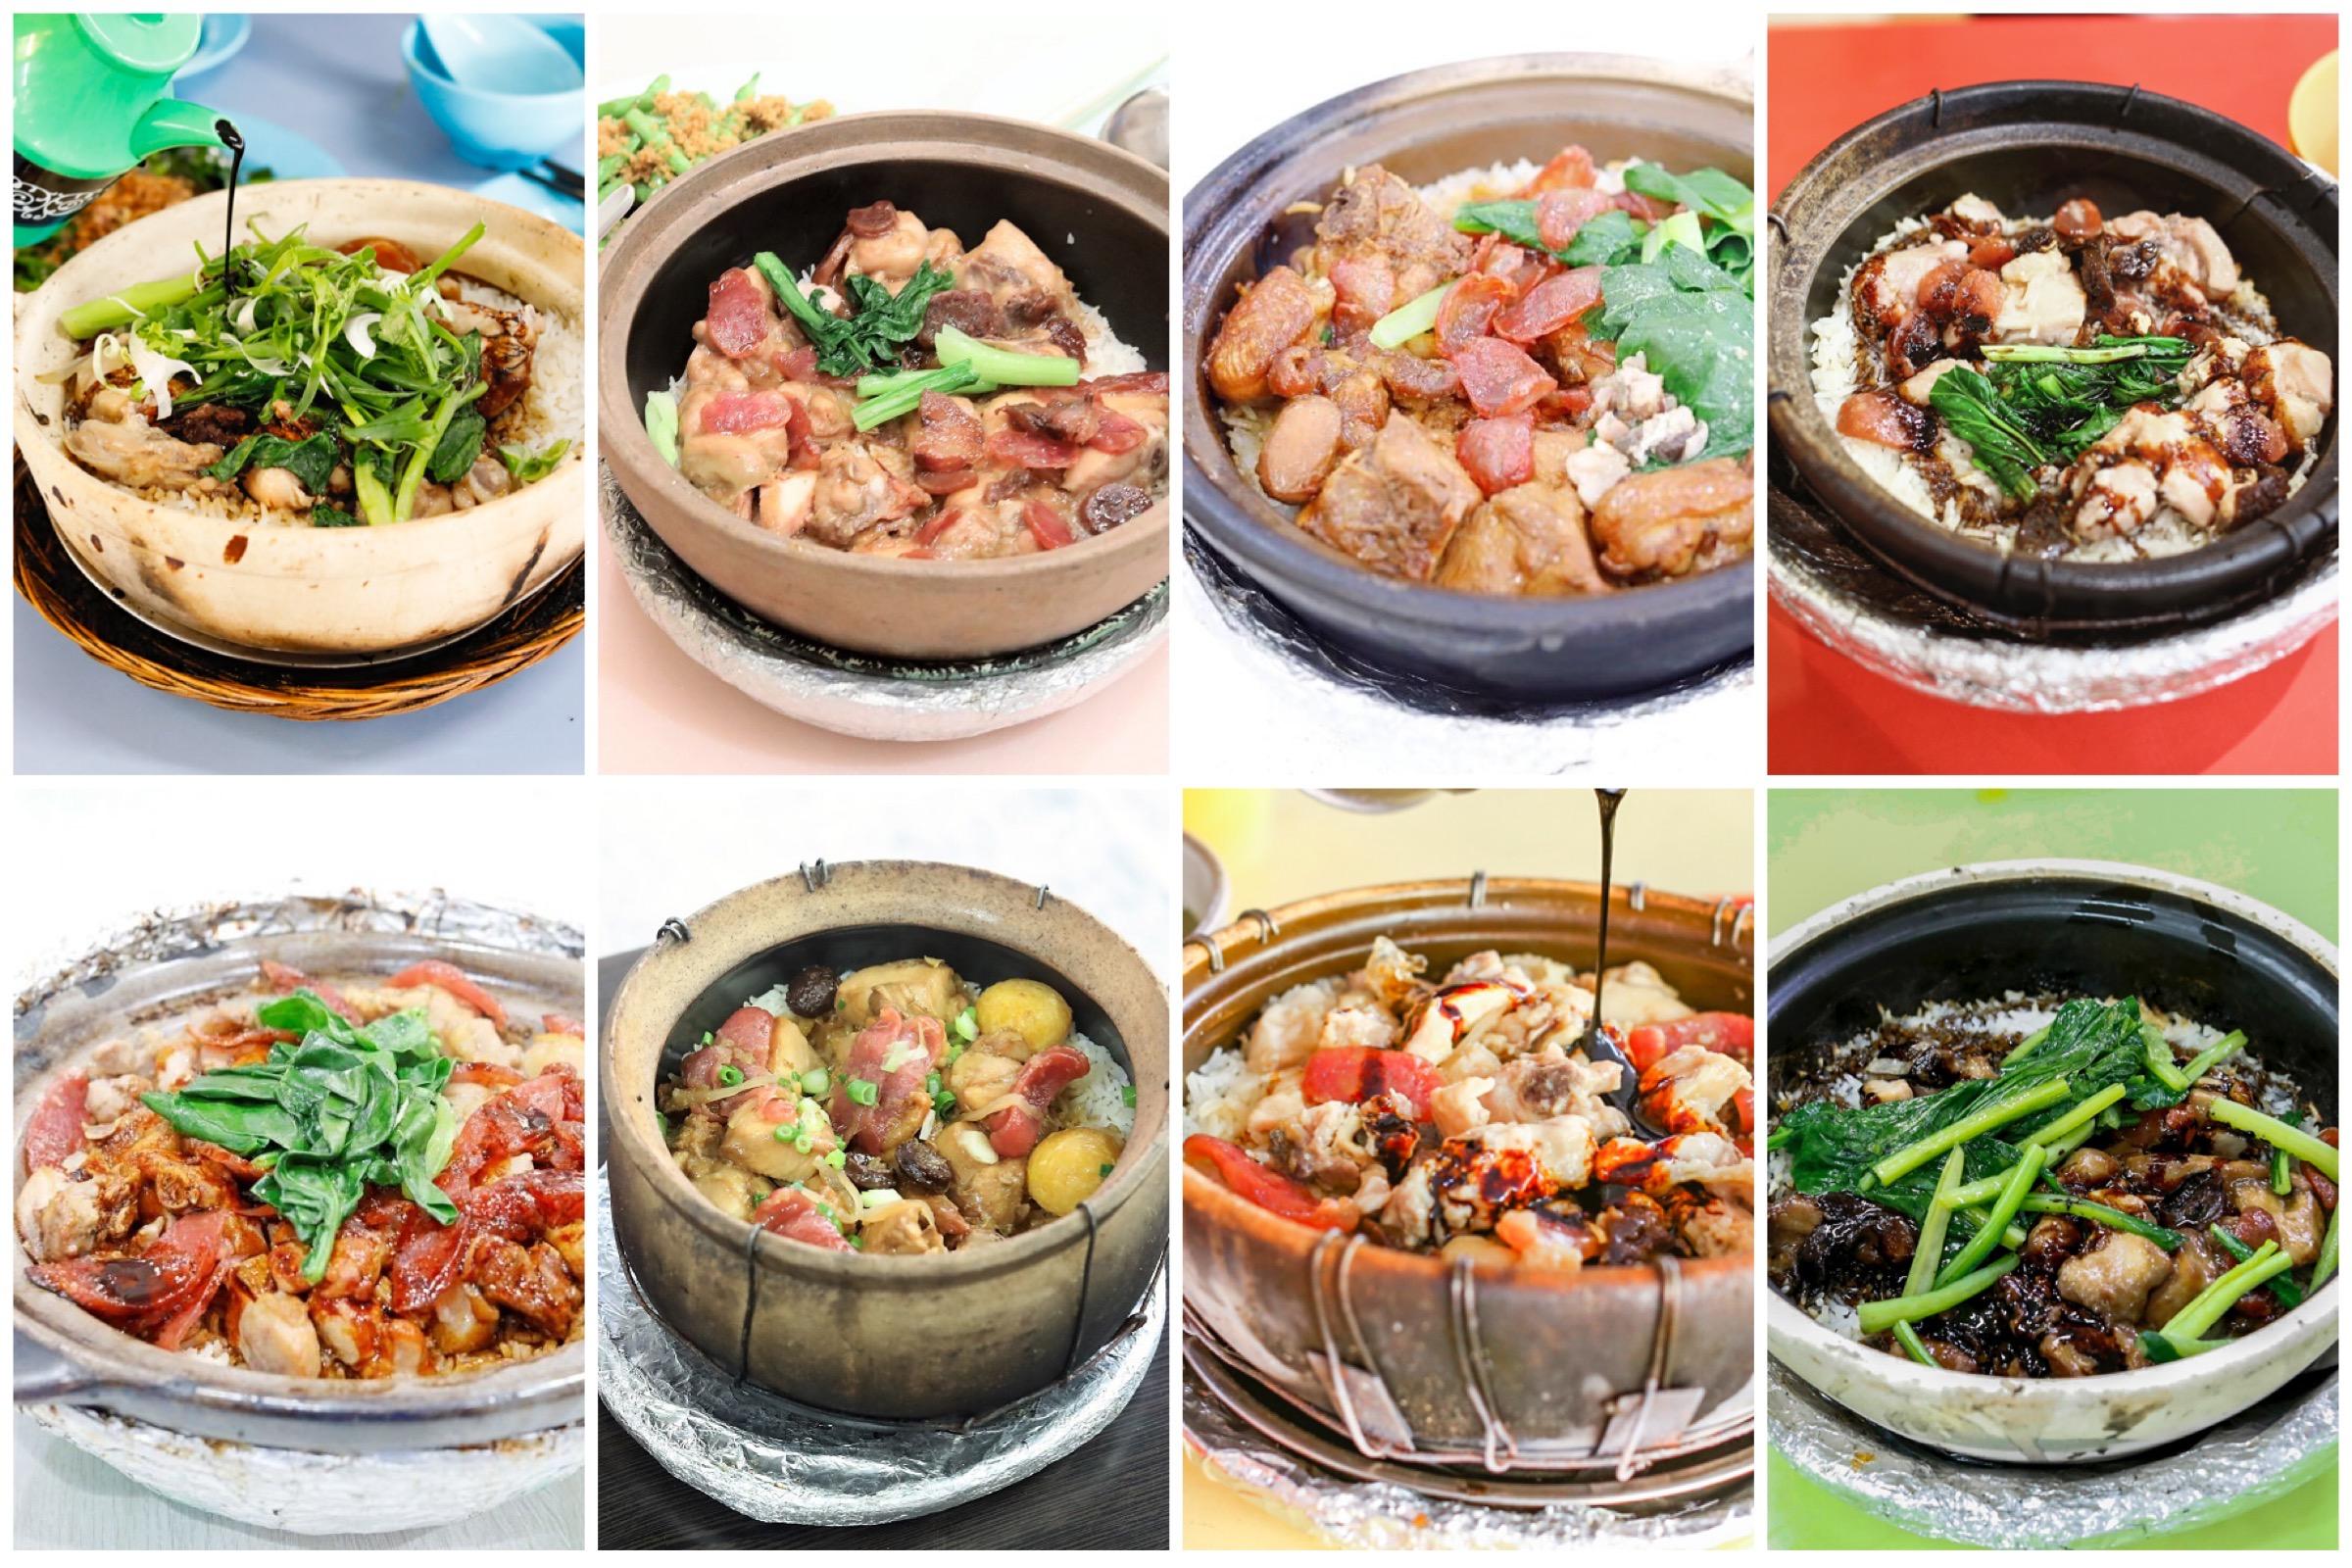 claypot rice singapore 2 Must-Try Claypot Rice In Singapore – From Lian He Ben Ji, New